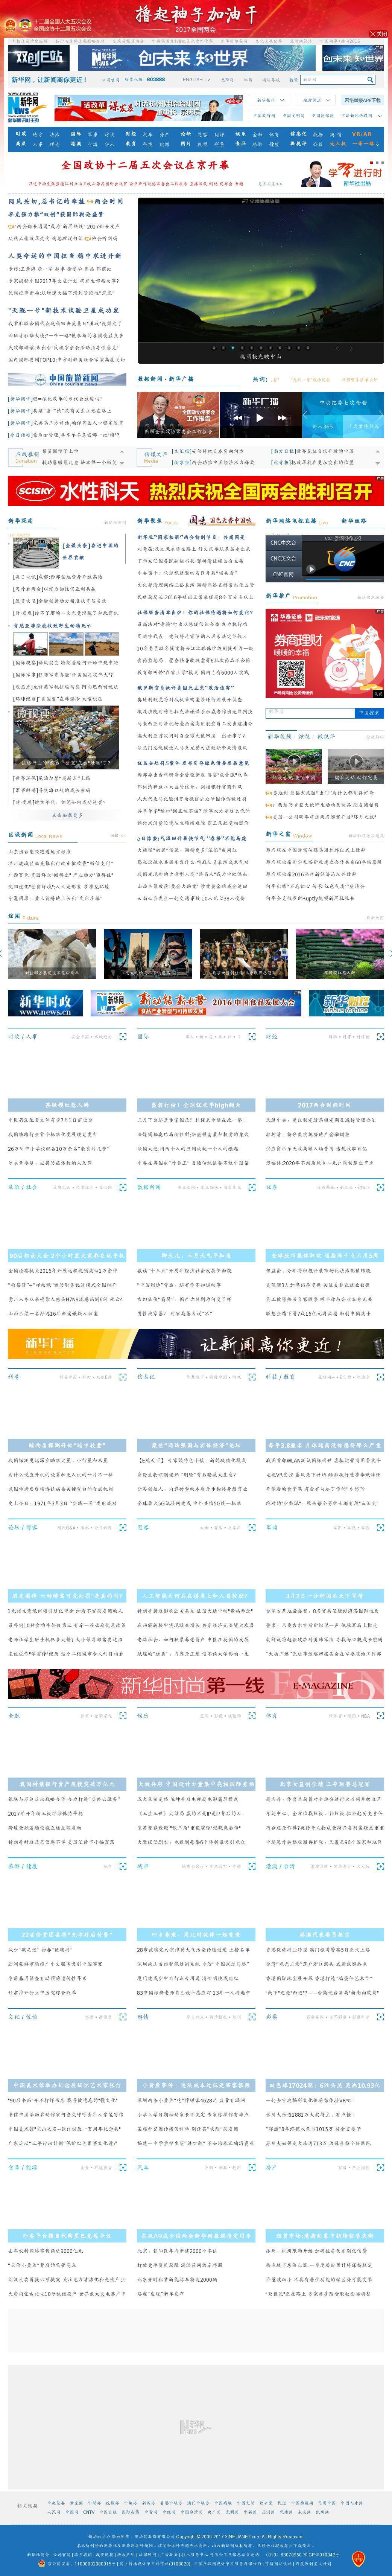 Xinhua at Friday March 3, 2017, 5:36 p.m. UTC